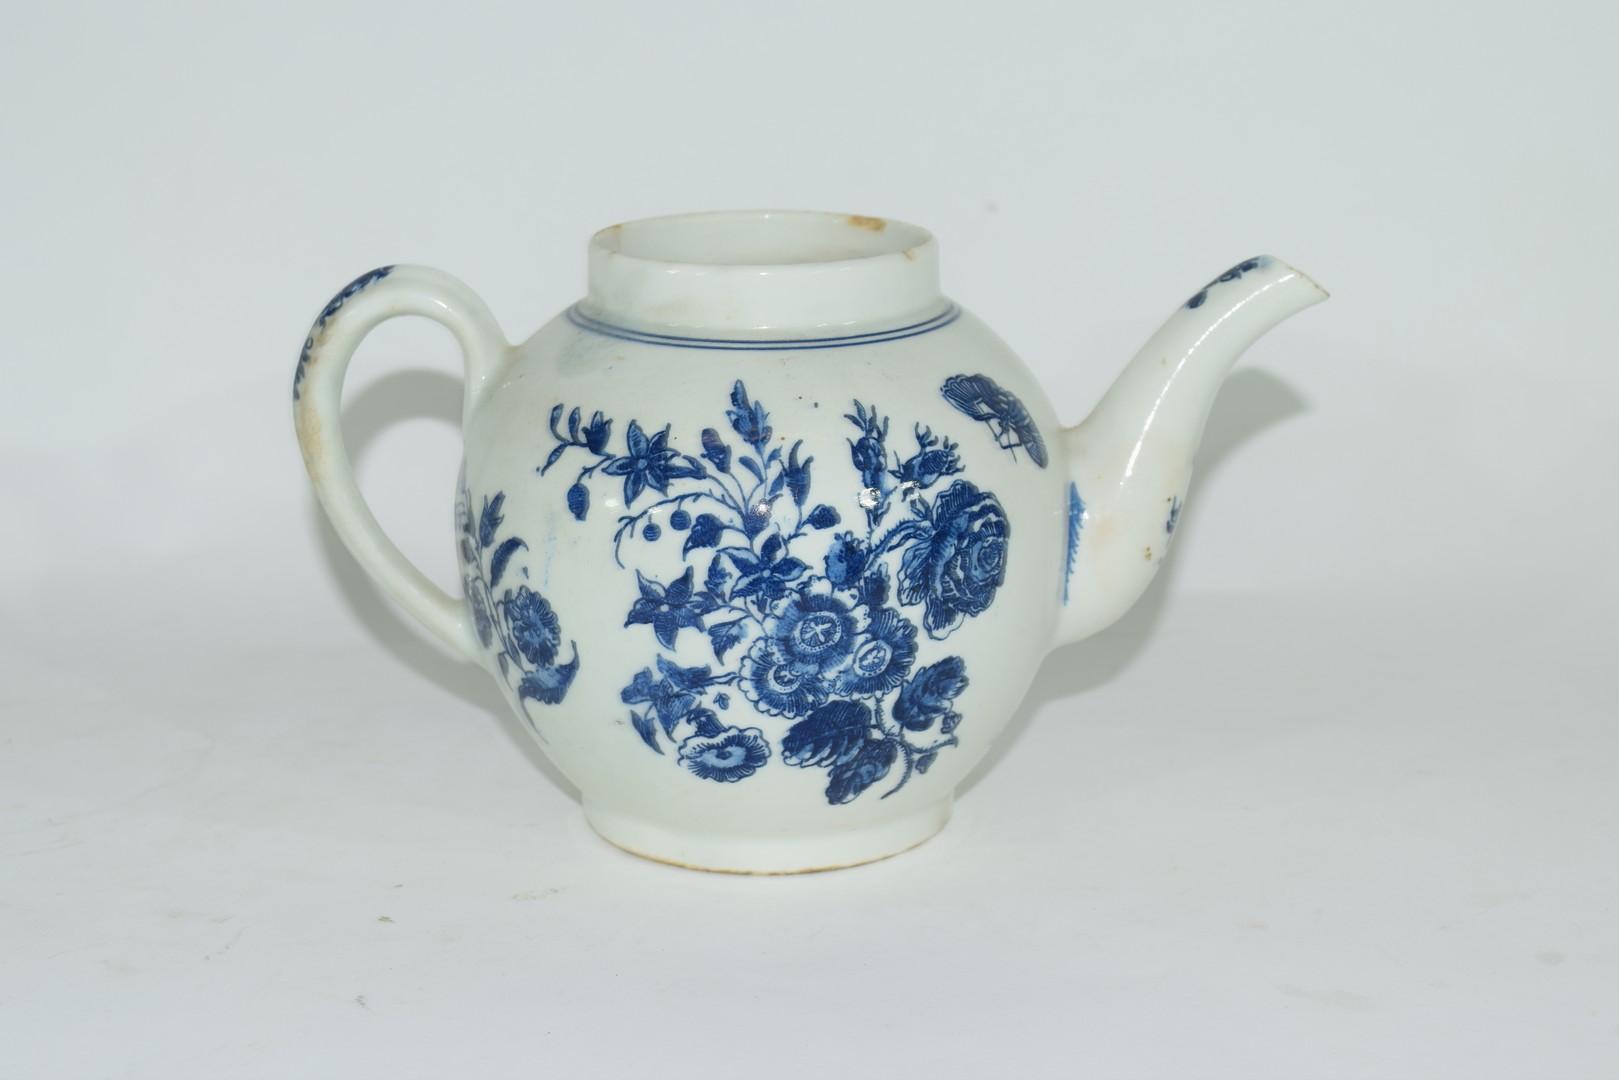 18th century Lowestoft porcelain teapot - Image 3 of 8